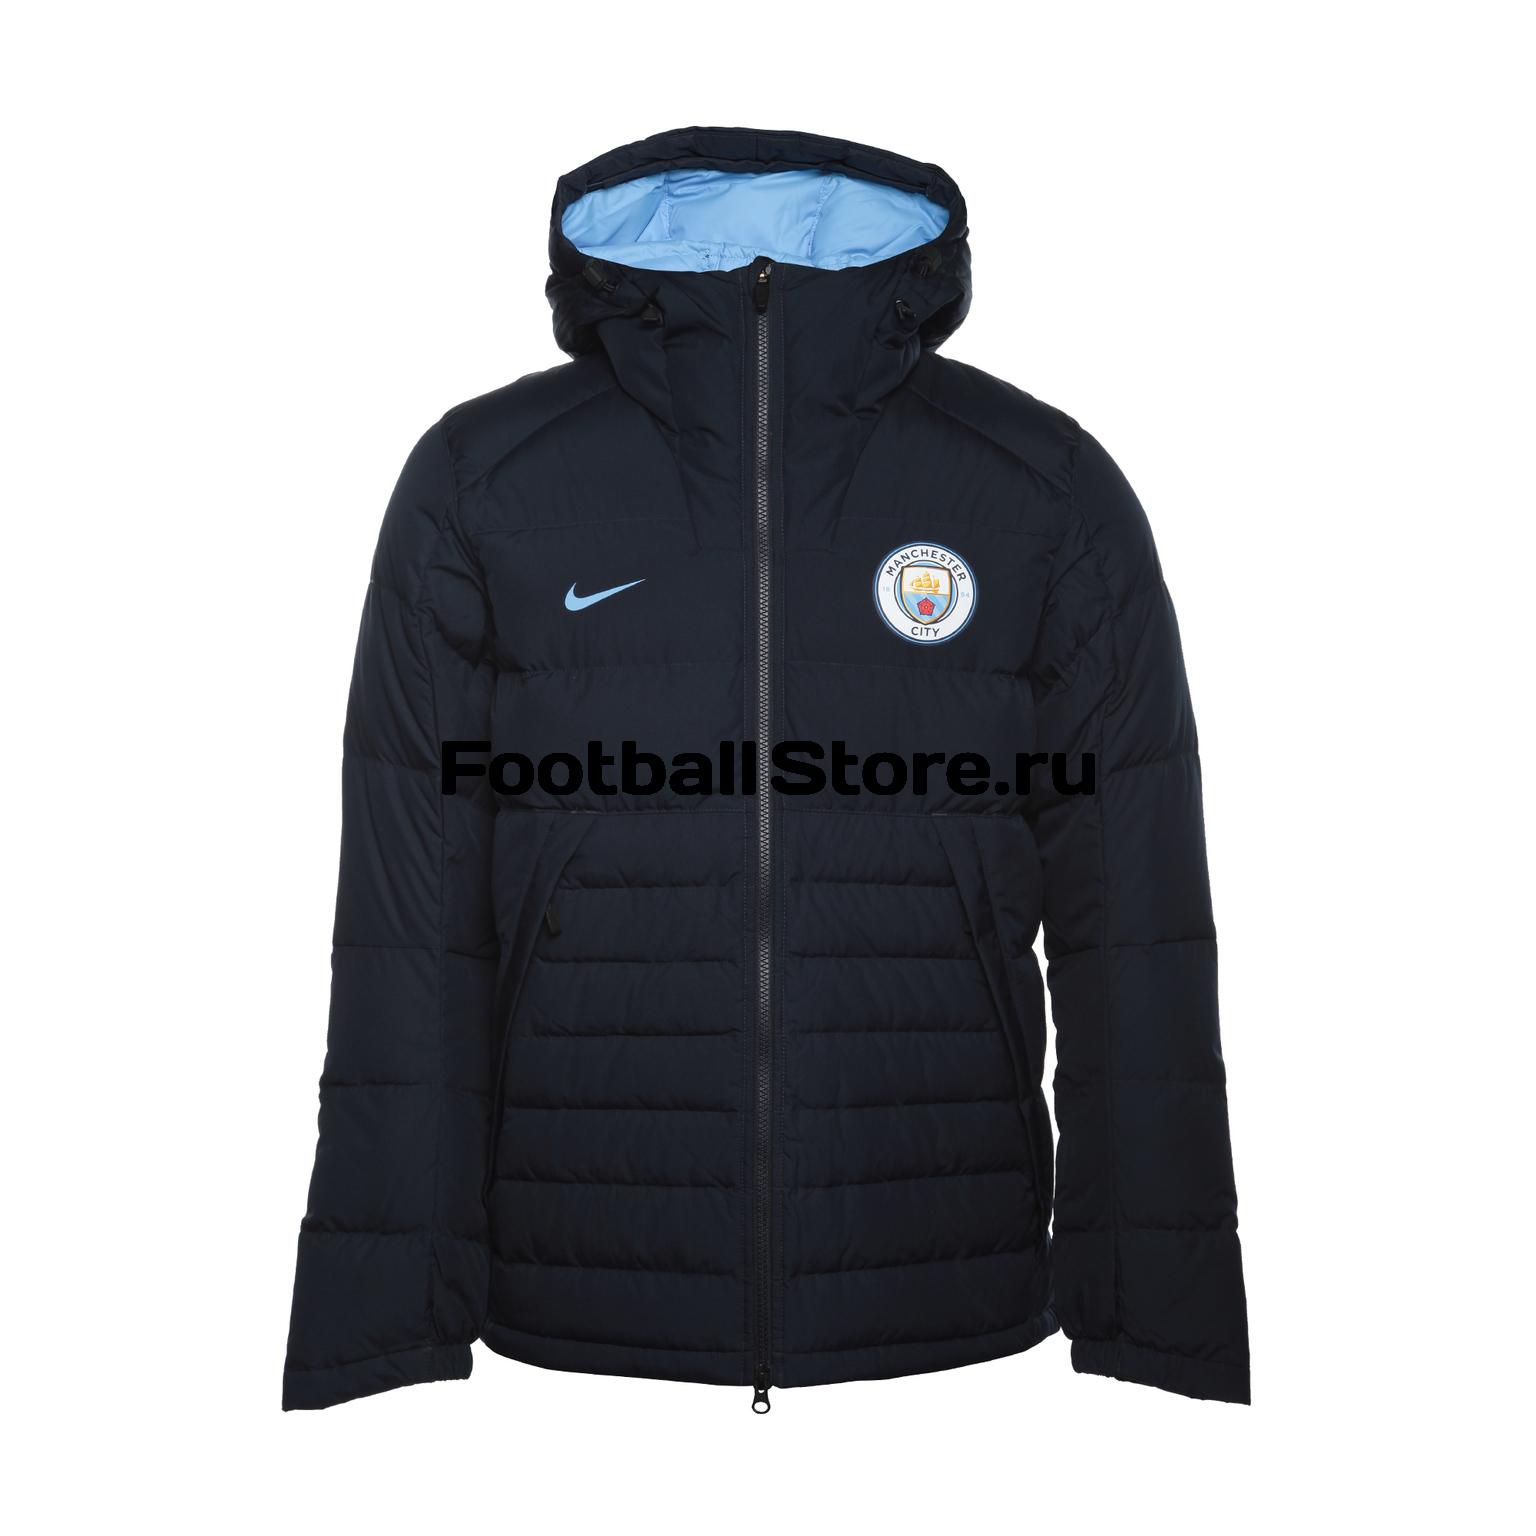 Куртки/Пуховики Nike Пуховик Nike Manchester City 886801-475